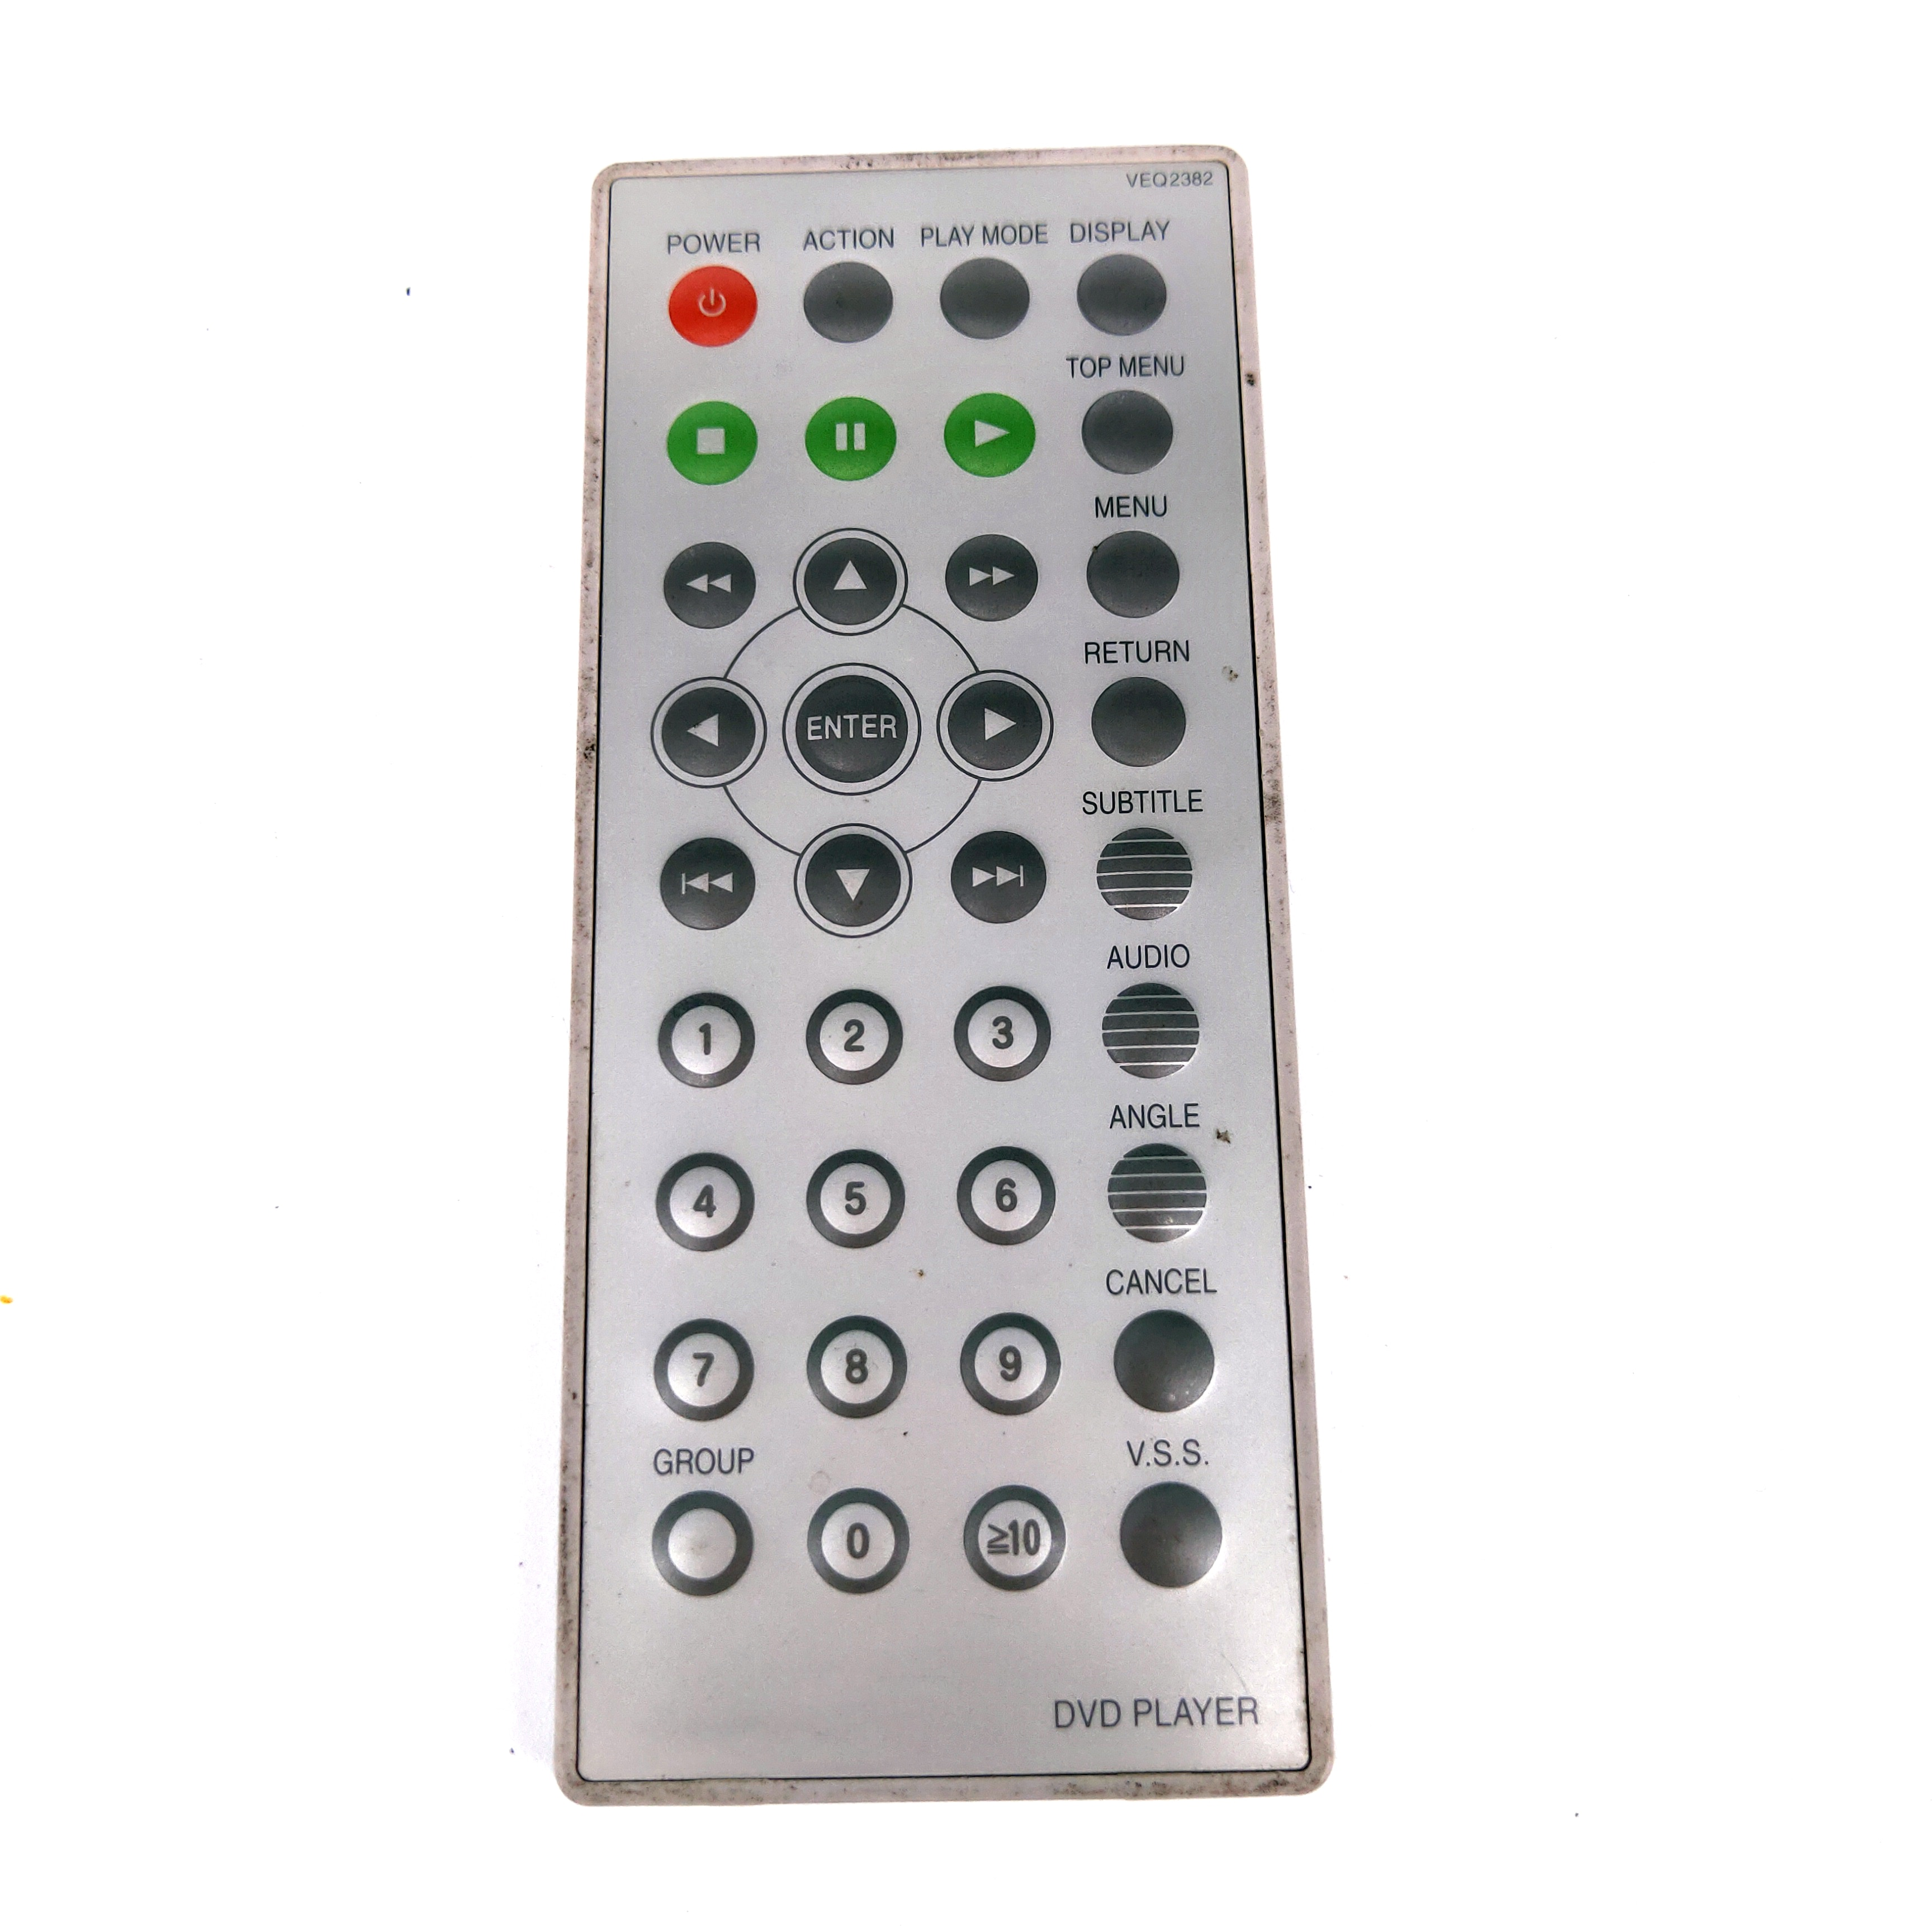 Used Original for Panasonic DVD Player Remote control VEQ2382 for DVD-LA85 DVD-LA85D DVD-PA65 DVD-PA65D DVDLA85 DVDLA85D DVDPA65